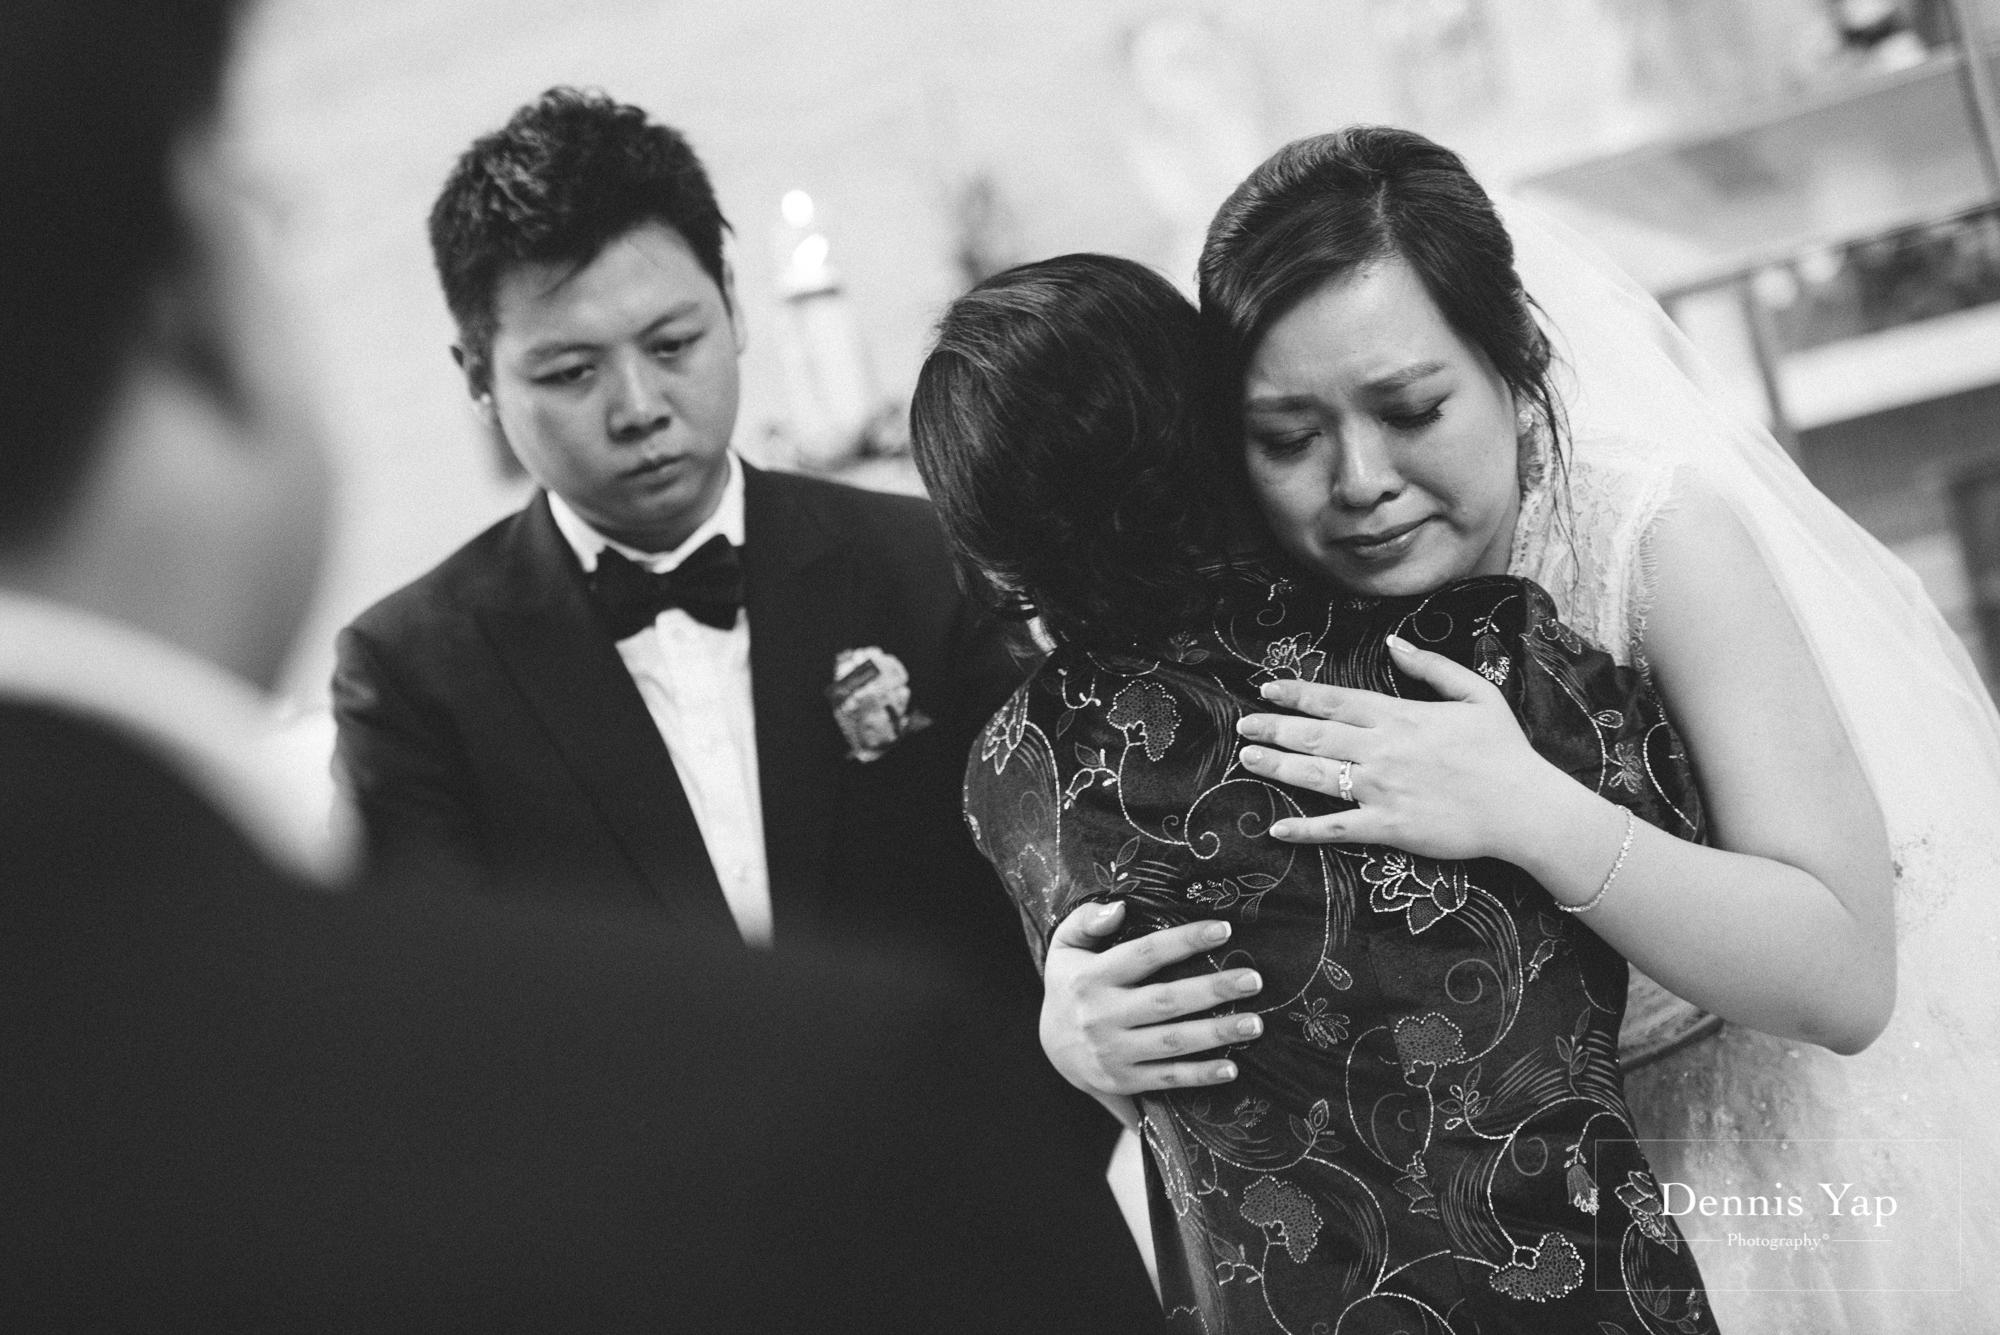 ino sheri black white church wedding st thomas more subang jaya dennis yap photography touching love beloved australia indonesia-36.jpg